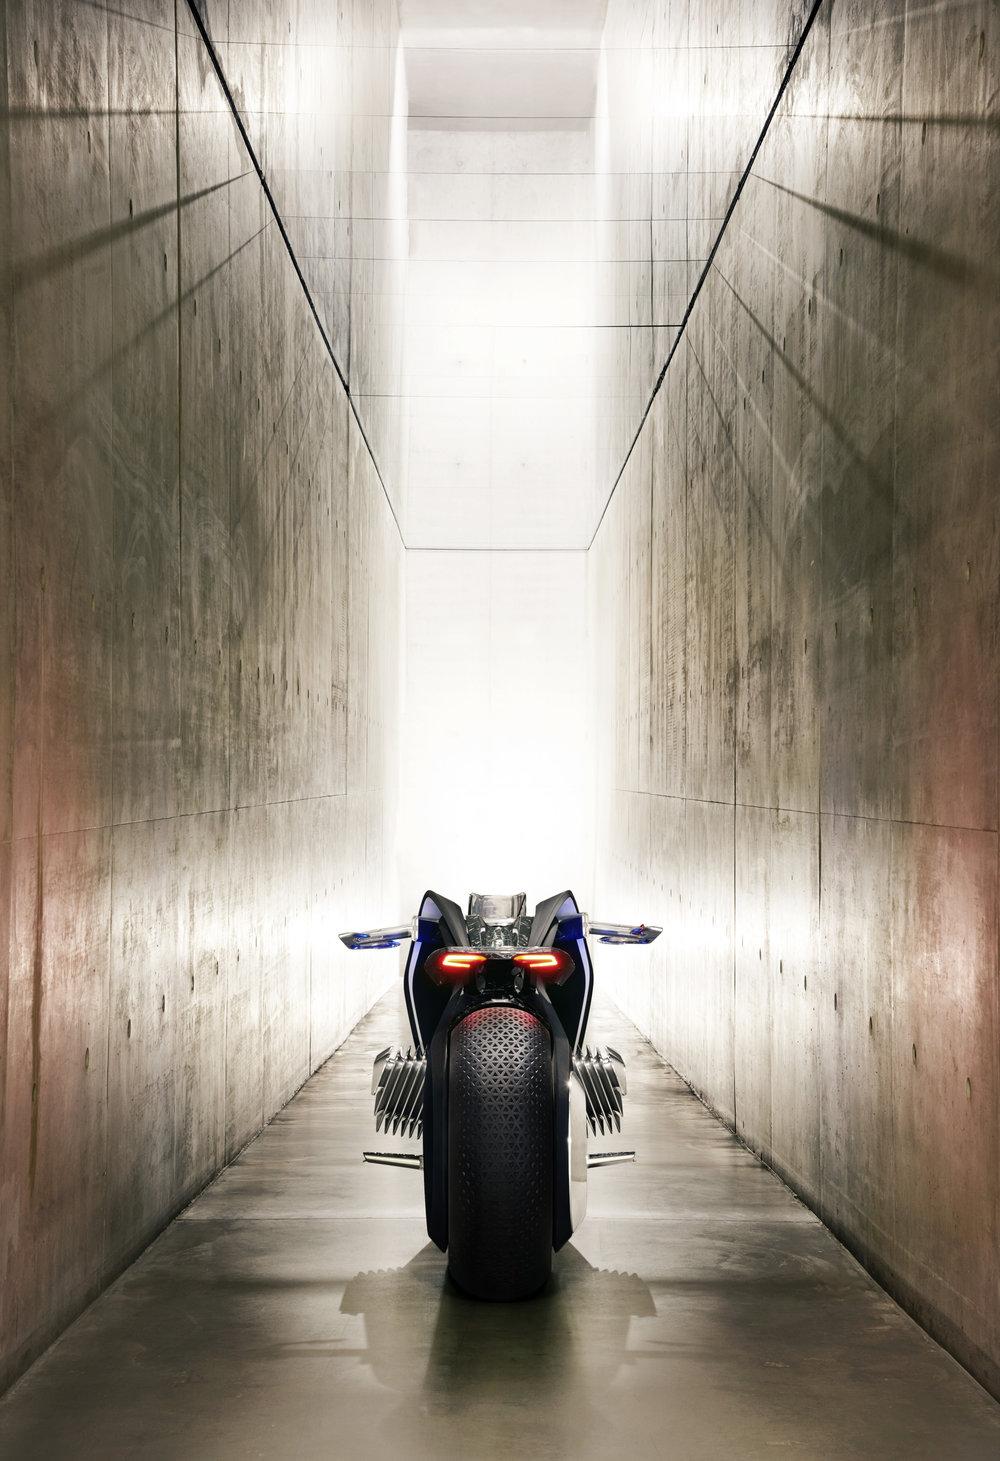 P90238707_highRes_bmw-motorrad-vision-.jpg